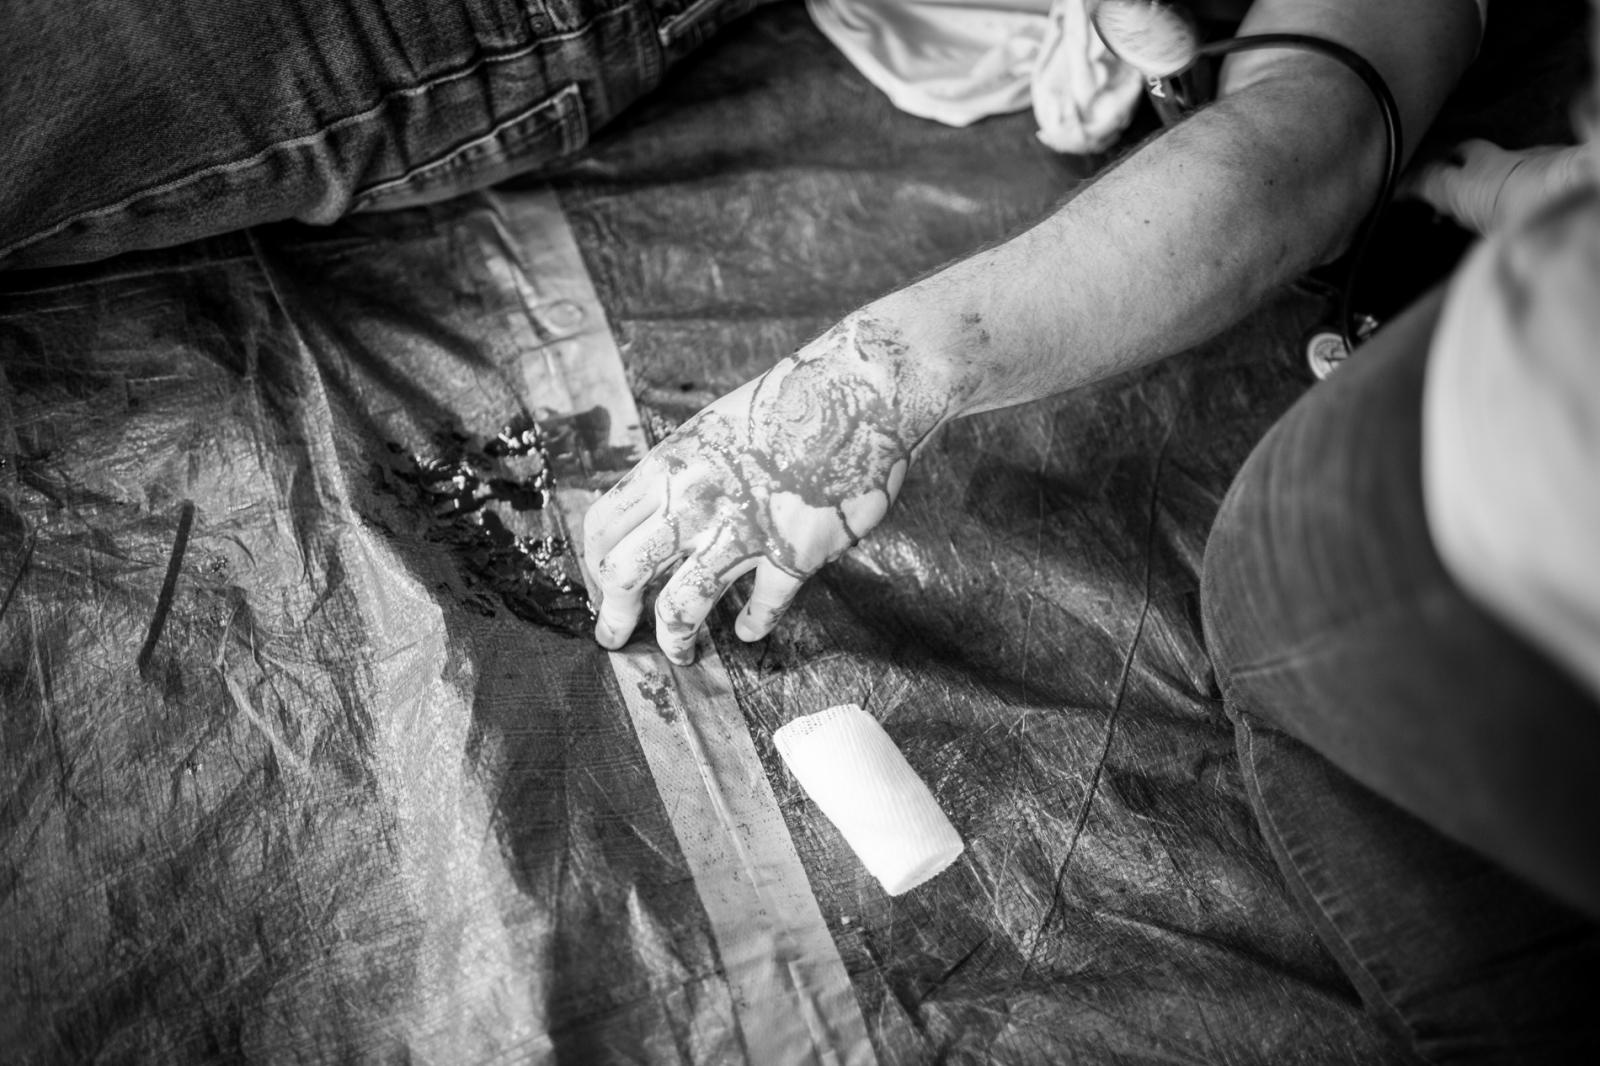 Art and Documentary Photography - Loading EMS_2016_lindsaymorris-24.jpg